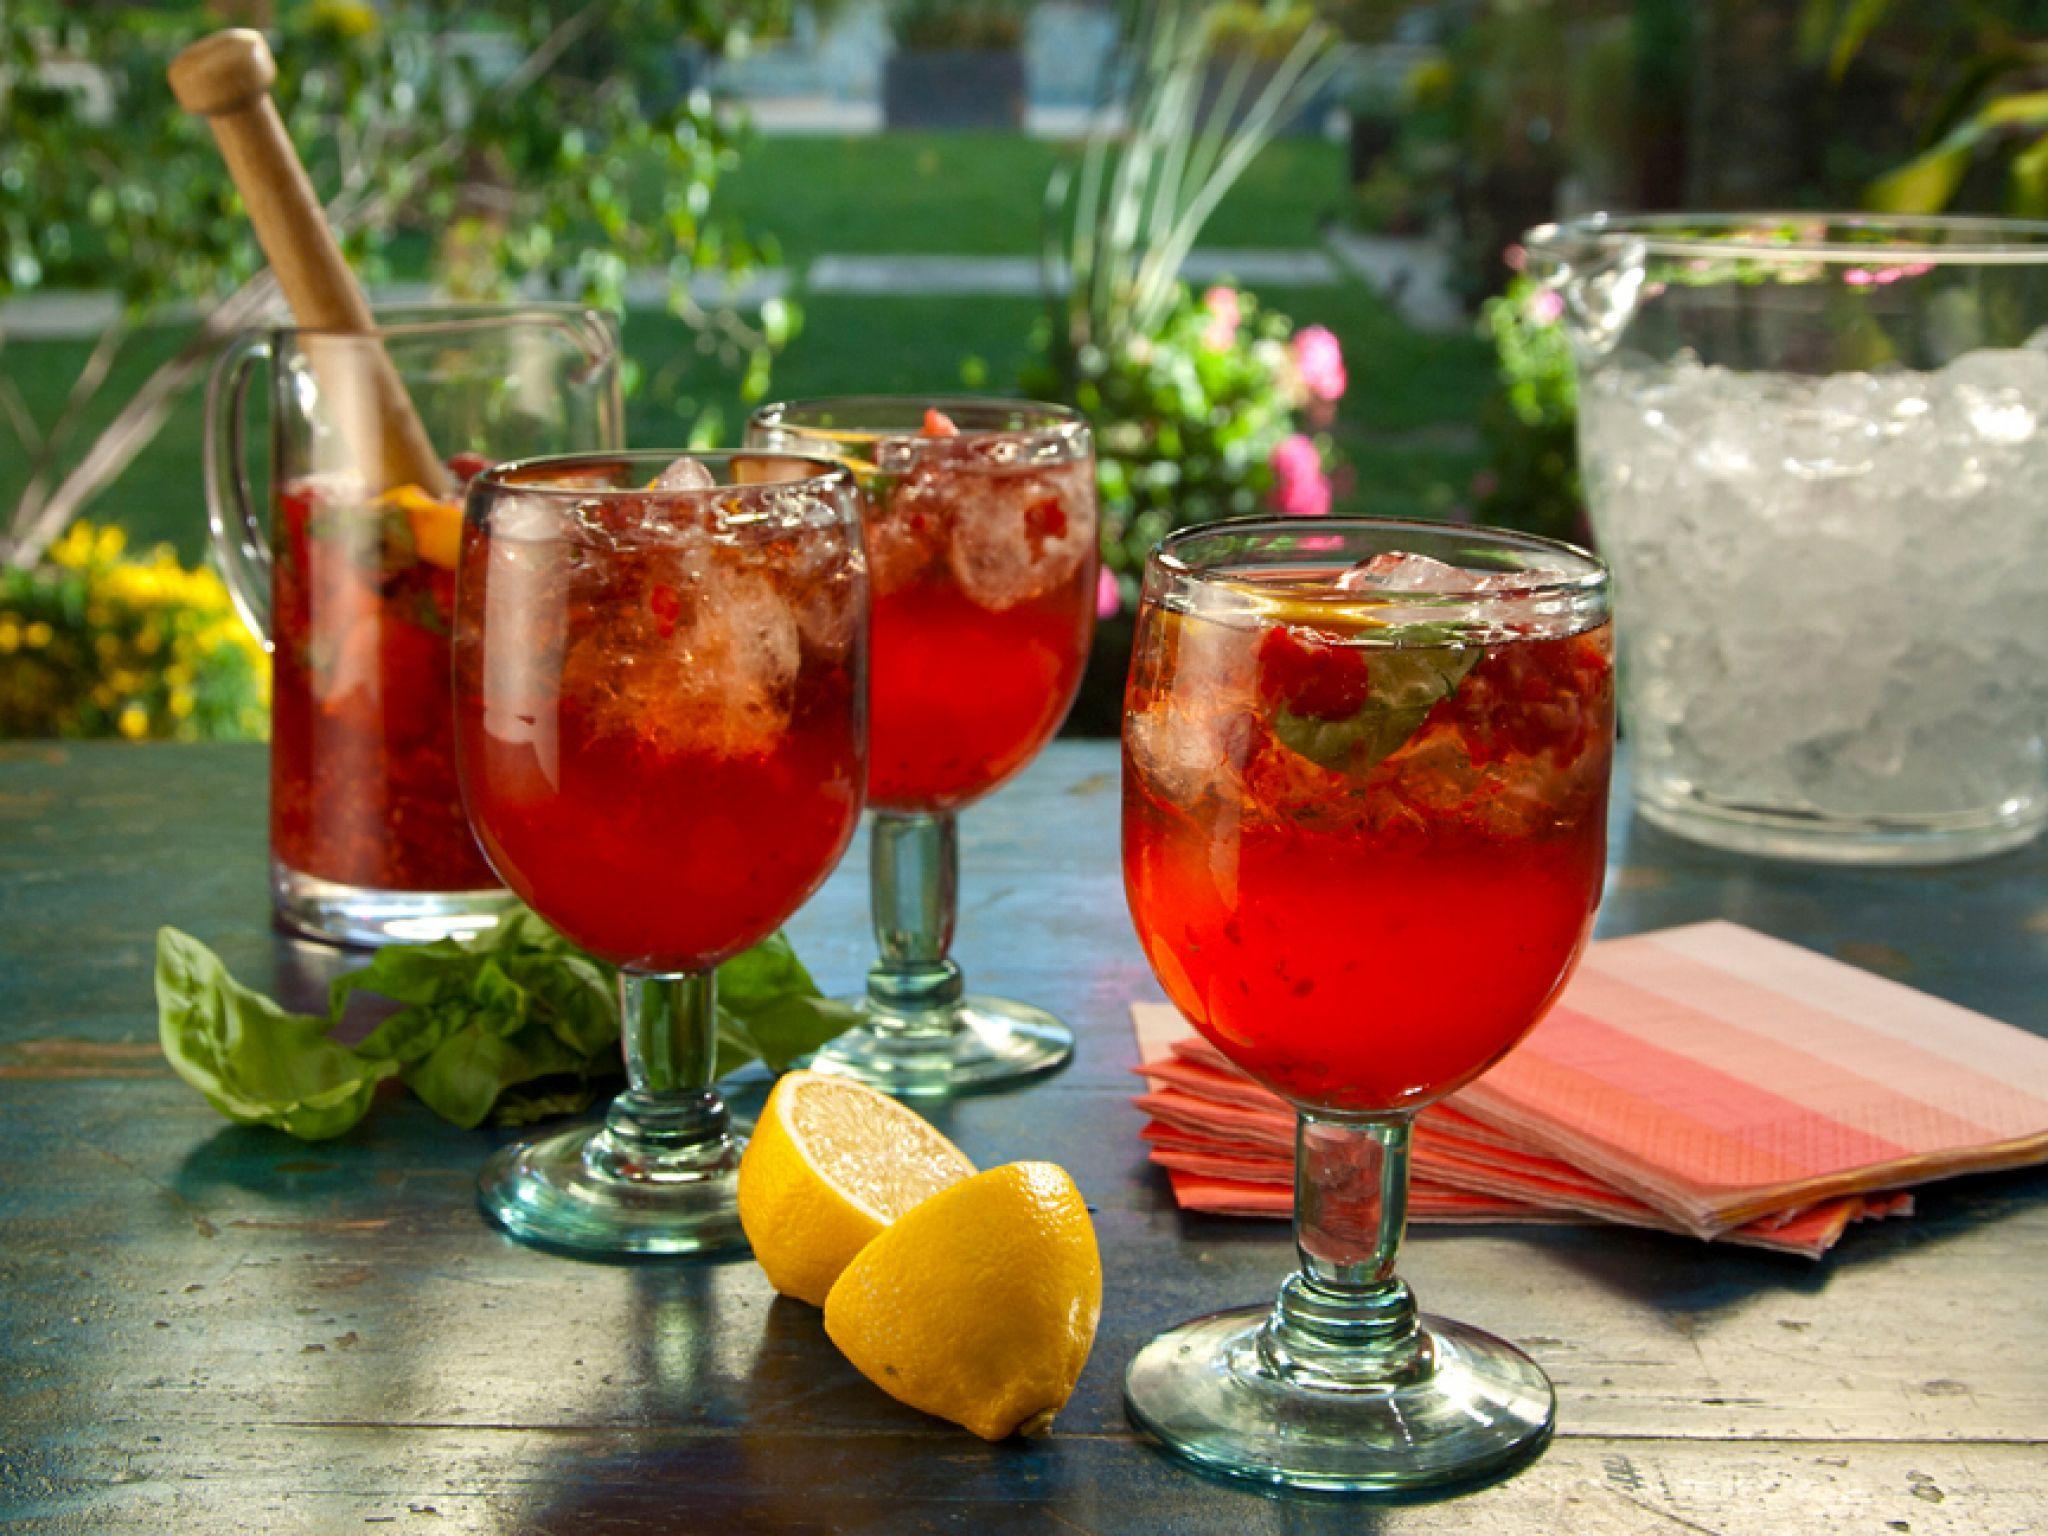 Raspberry Basil Limoncello Cocktail Recipe Limoncello Cocktails Food Network Recipes Summer Drink Recipes